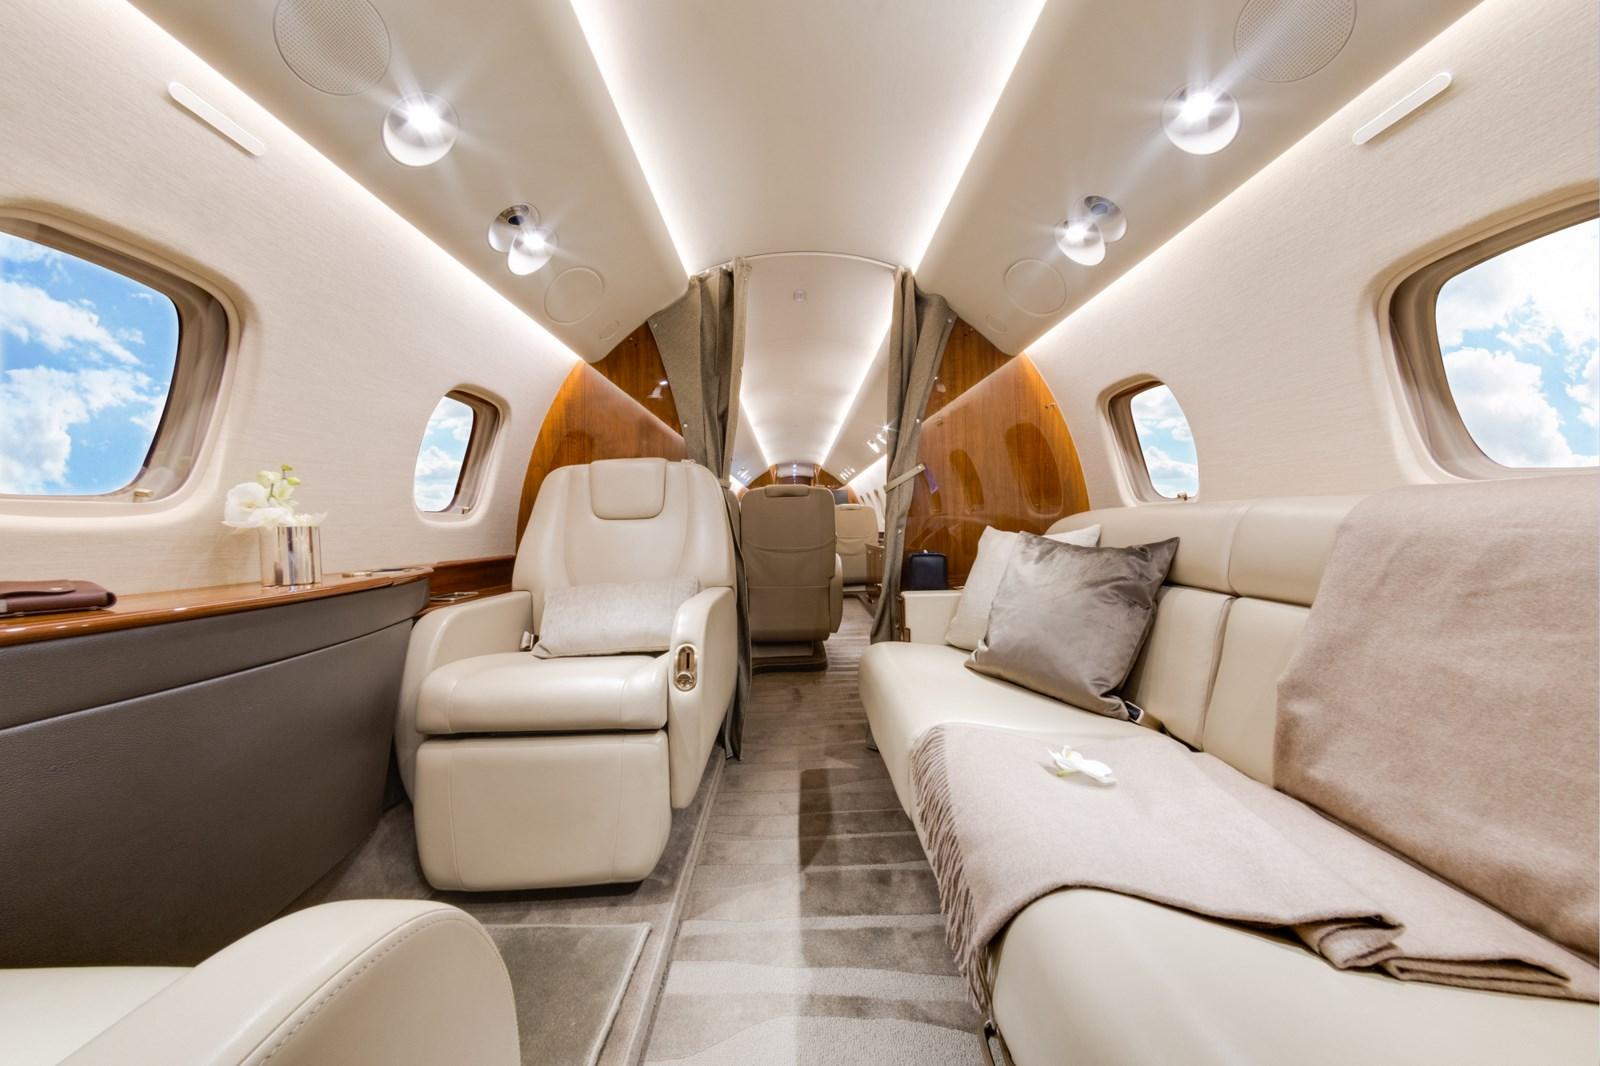 embraer_legacy_650_lx-mia_aft_cabin_2_1600x1200.jpg